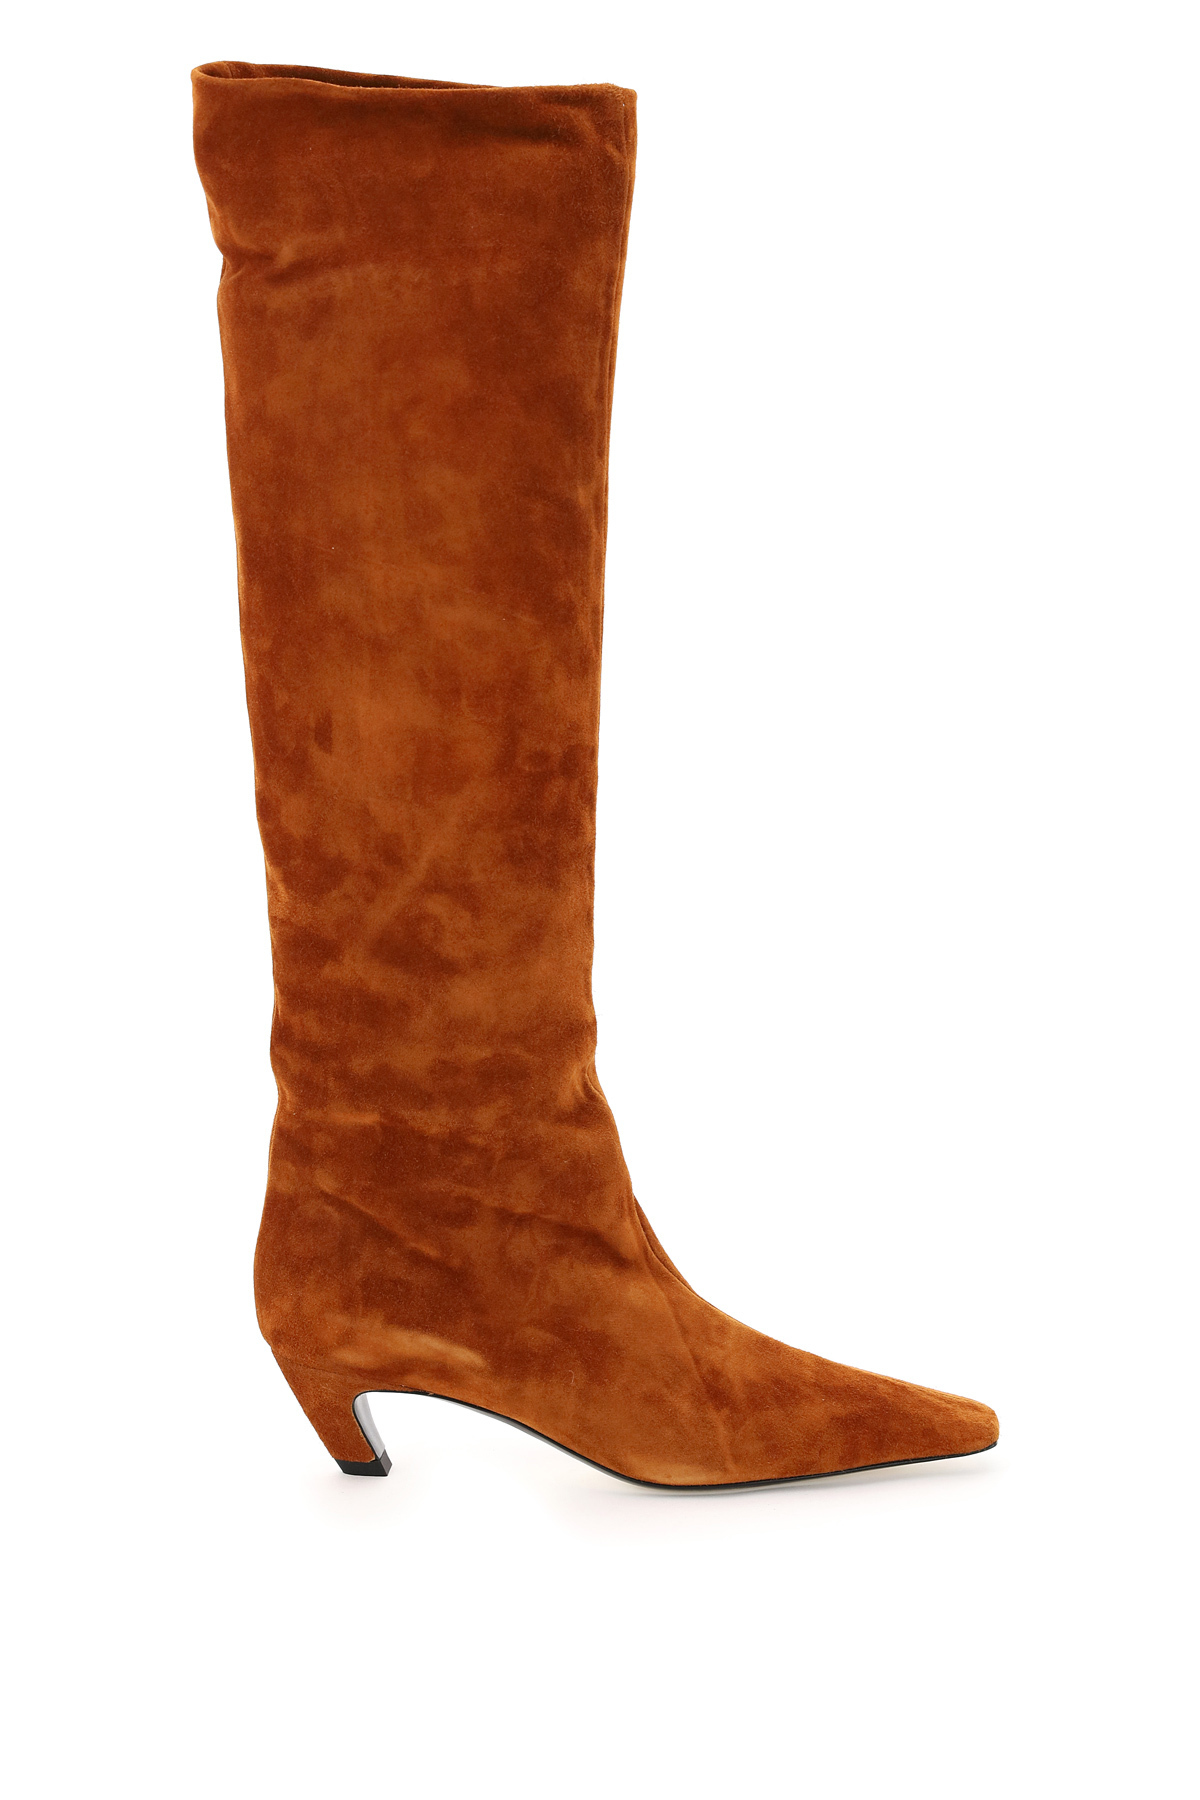 KHAITE DAVIS KNEE-HIGH SUEDE BOOTS 39 Brown, Orange Leather